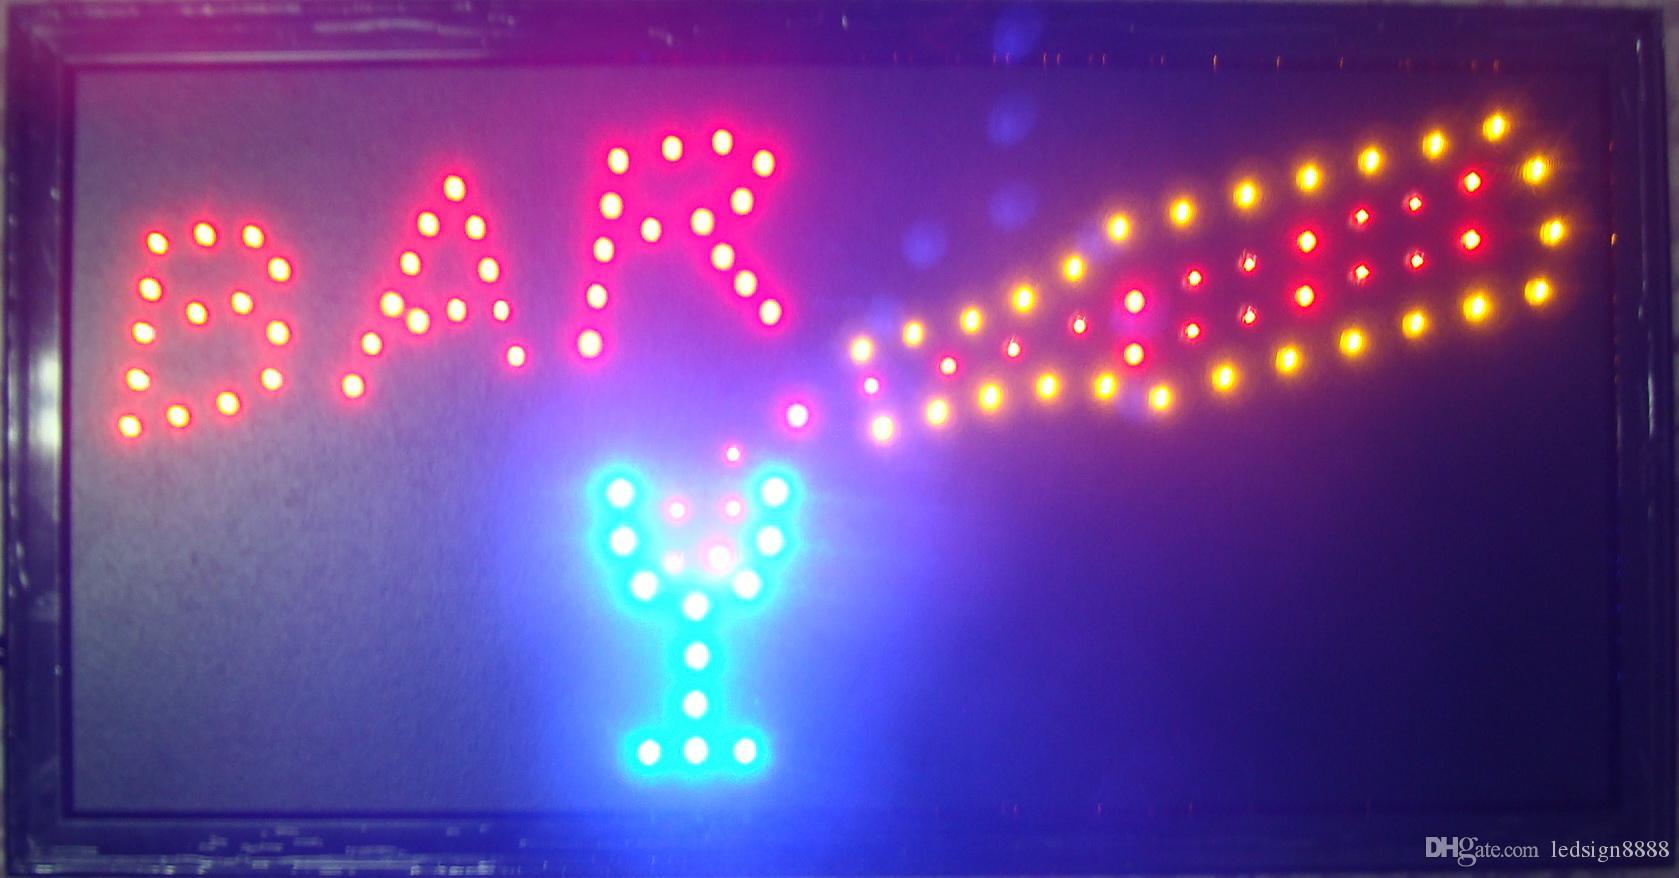 Direktverkauf Customed Niedrig Power 10x19-Zoll-Bar-Speicher-Halb-Outdoor-Ultra-helle LED-Zeichenbrett